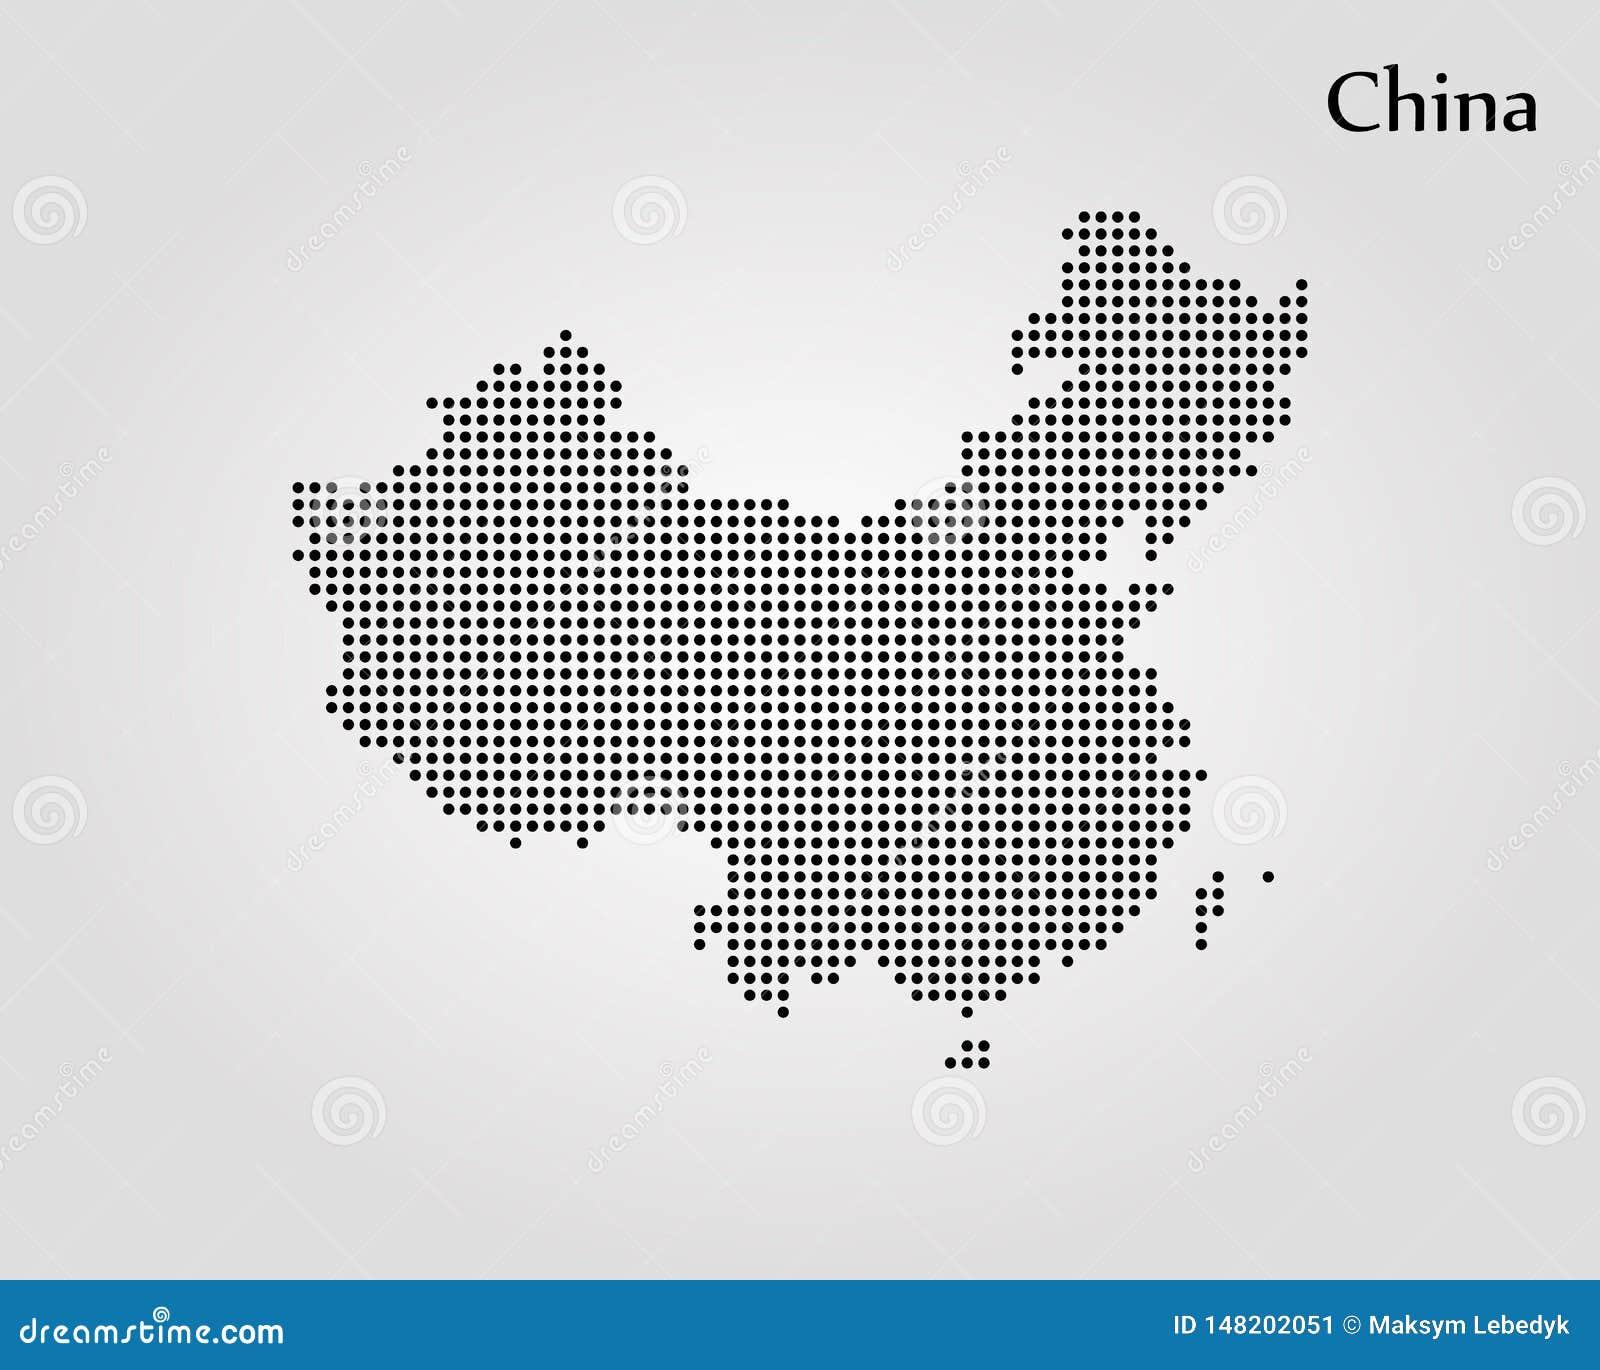 Map of China. Vector illustration. World map